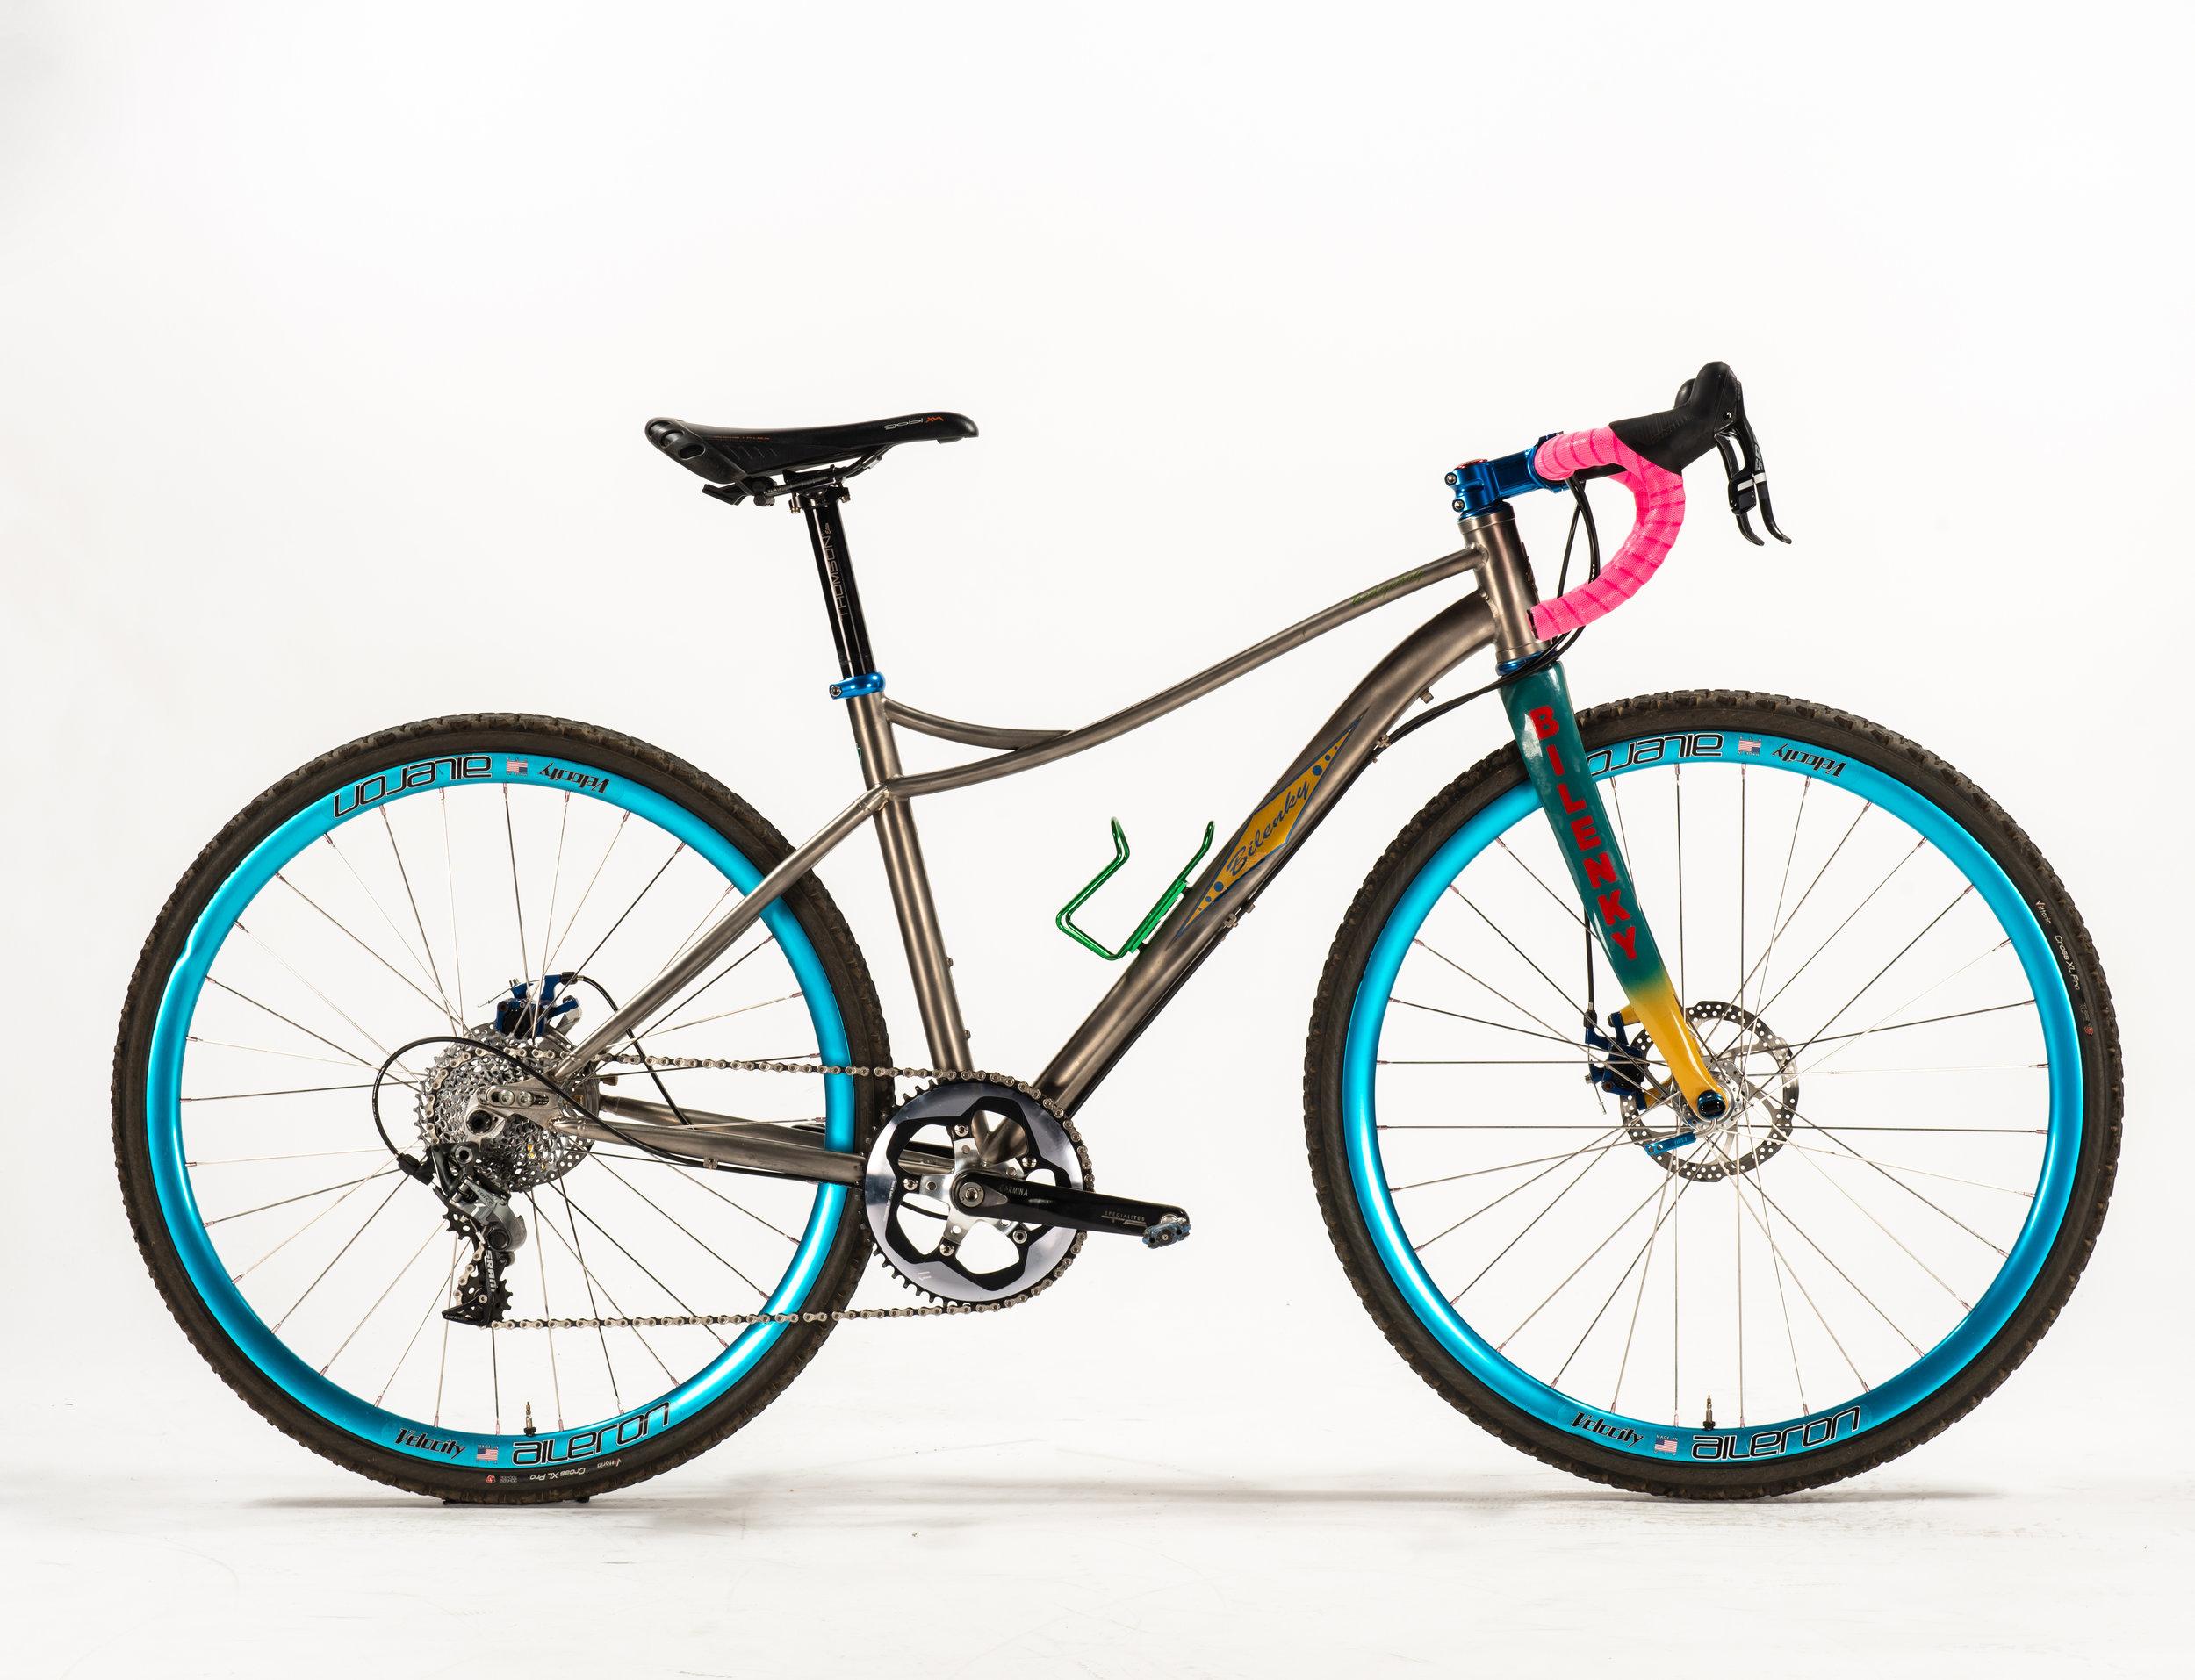 North American Handmade Bicycle Show  Quality   Inspiration   Craftsmanship